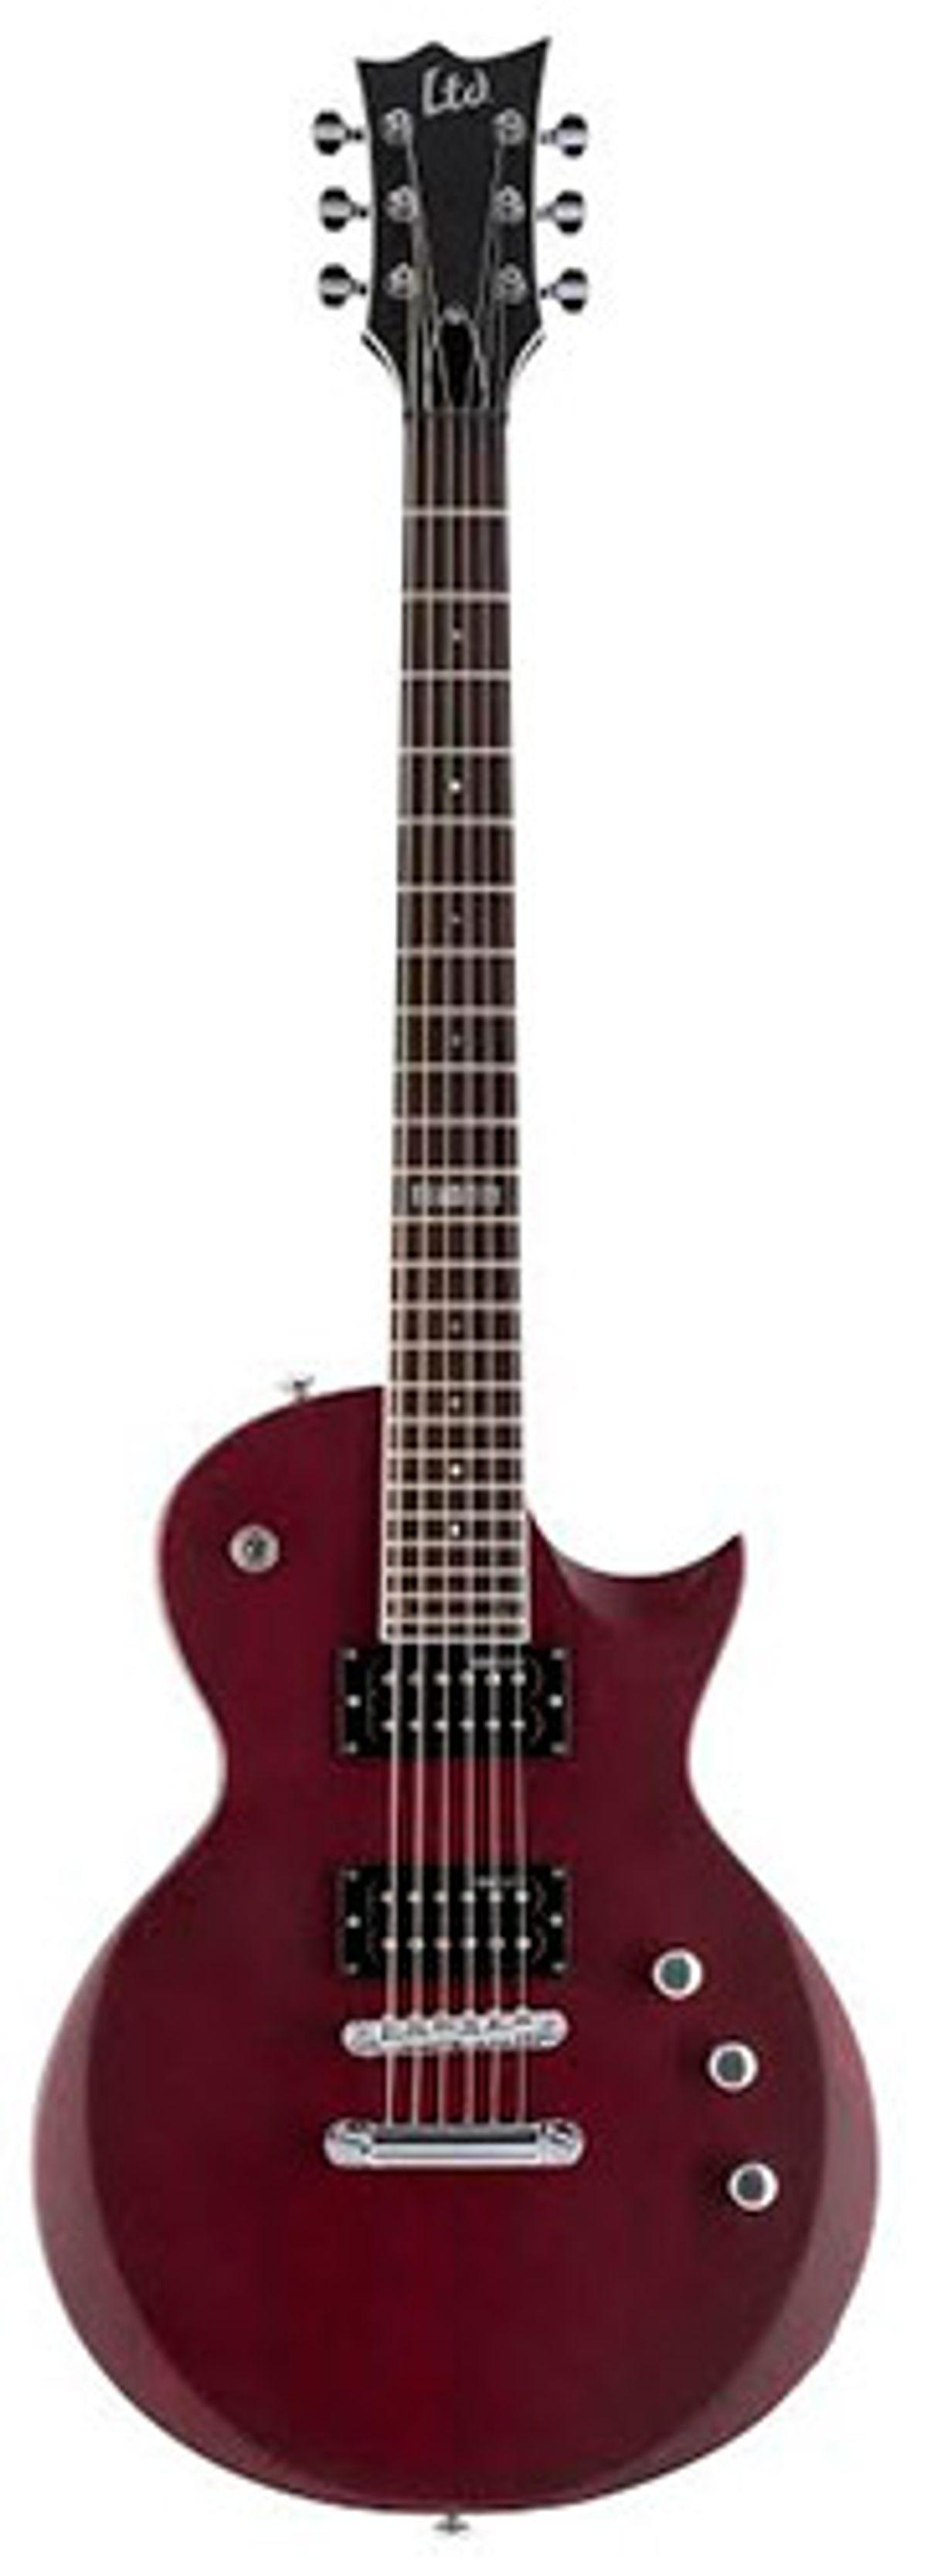 ESP Guitars Adds 16 Models to 200 Series